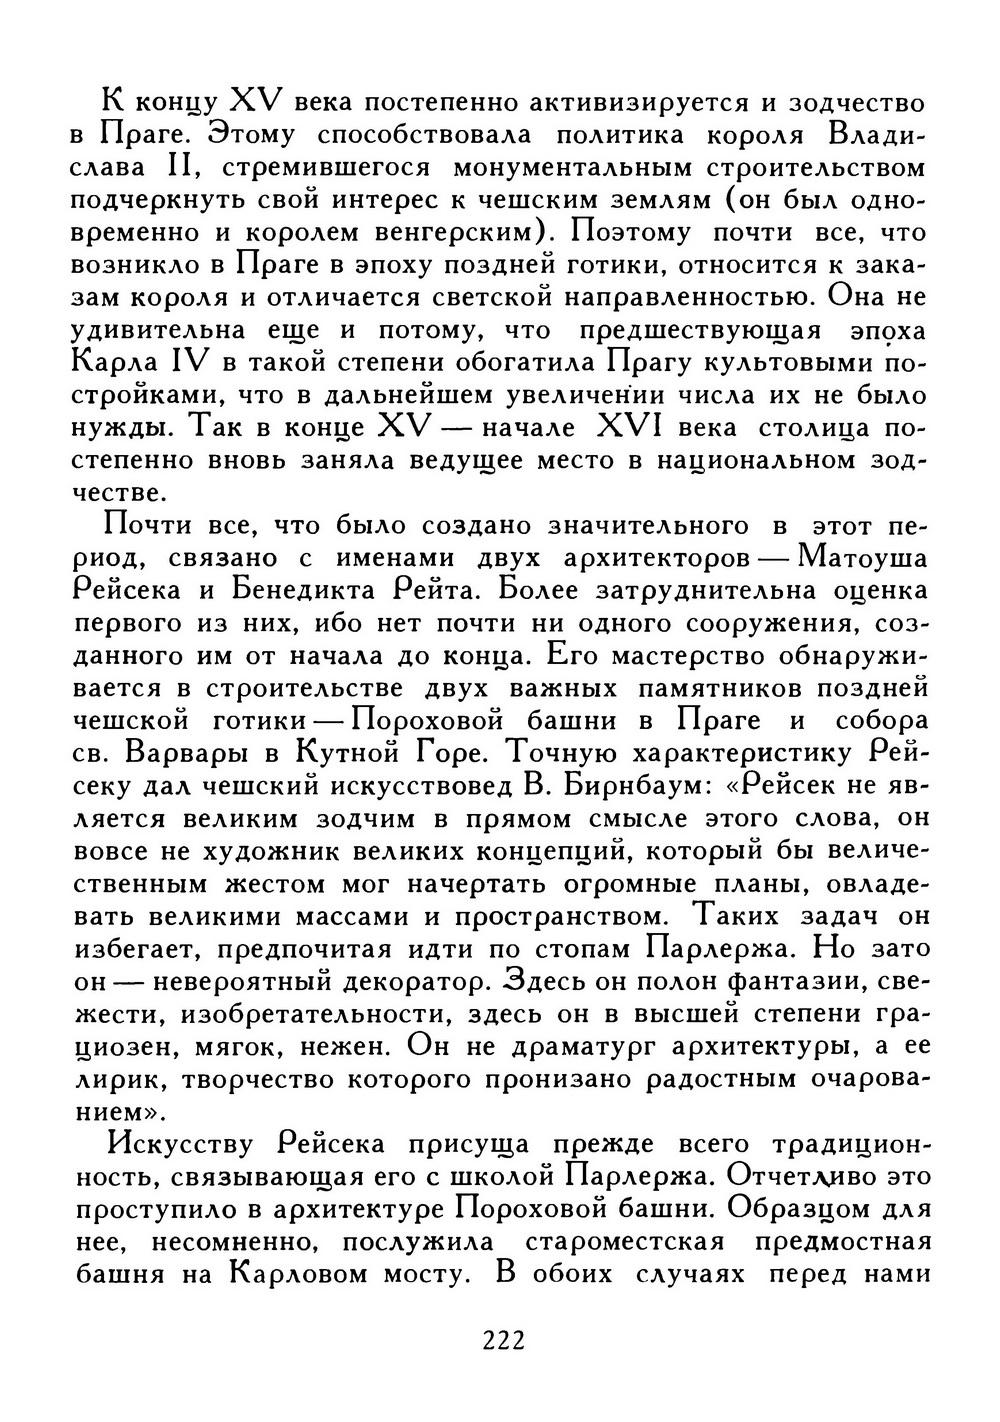 http://i6.imageban.ru/out/2017/02/09/ac8ec8a6aac6130cc44aef573adc0d3e.jpg